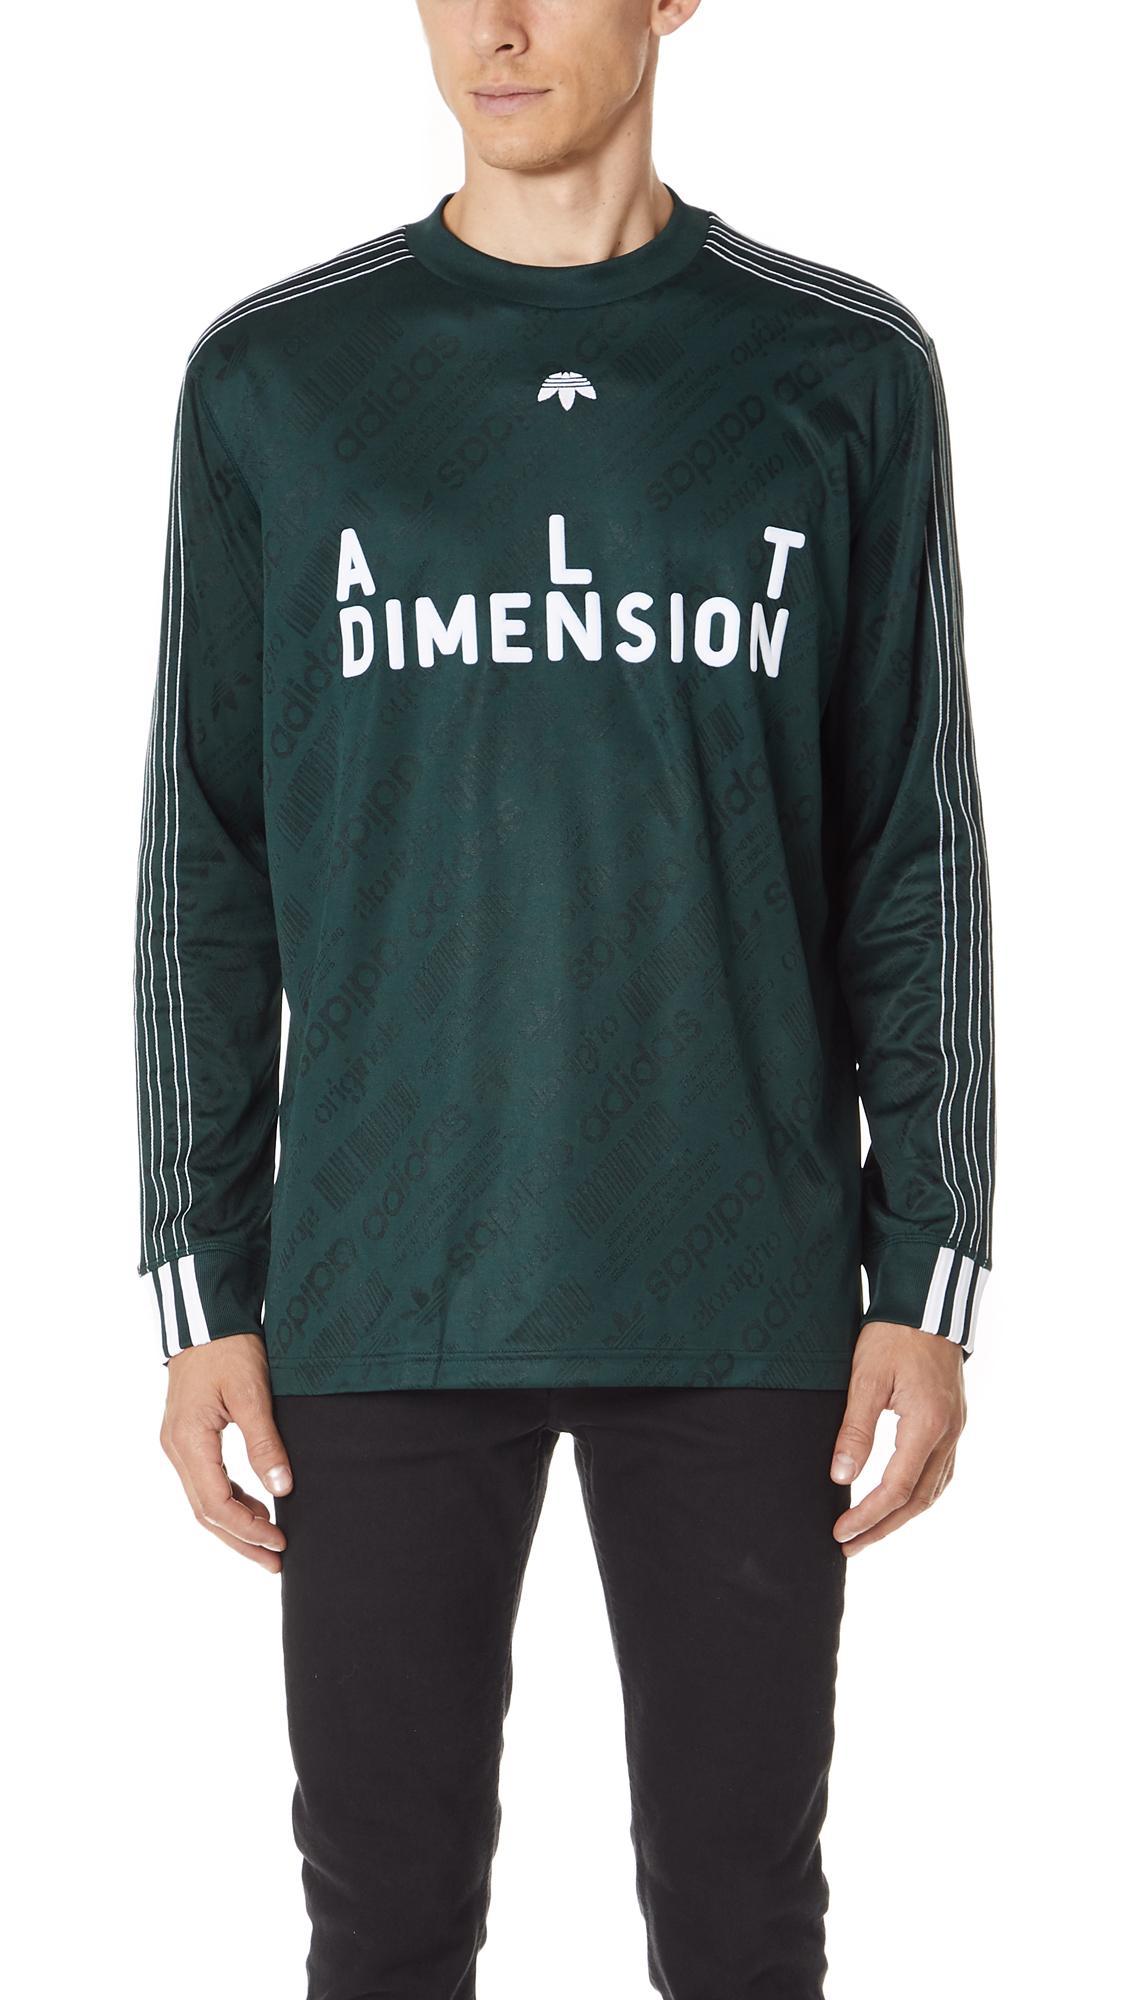 Adidas Originals By Alexander Wang Aw Soccer Long Sleeve Jersey In Green